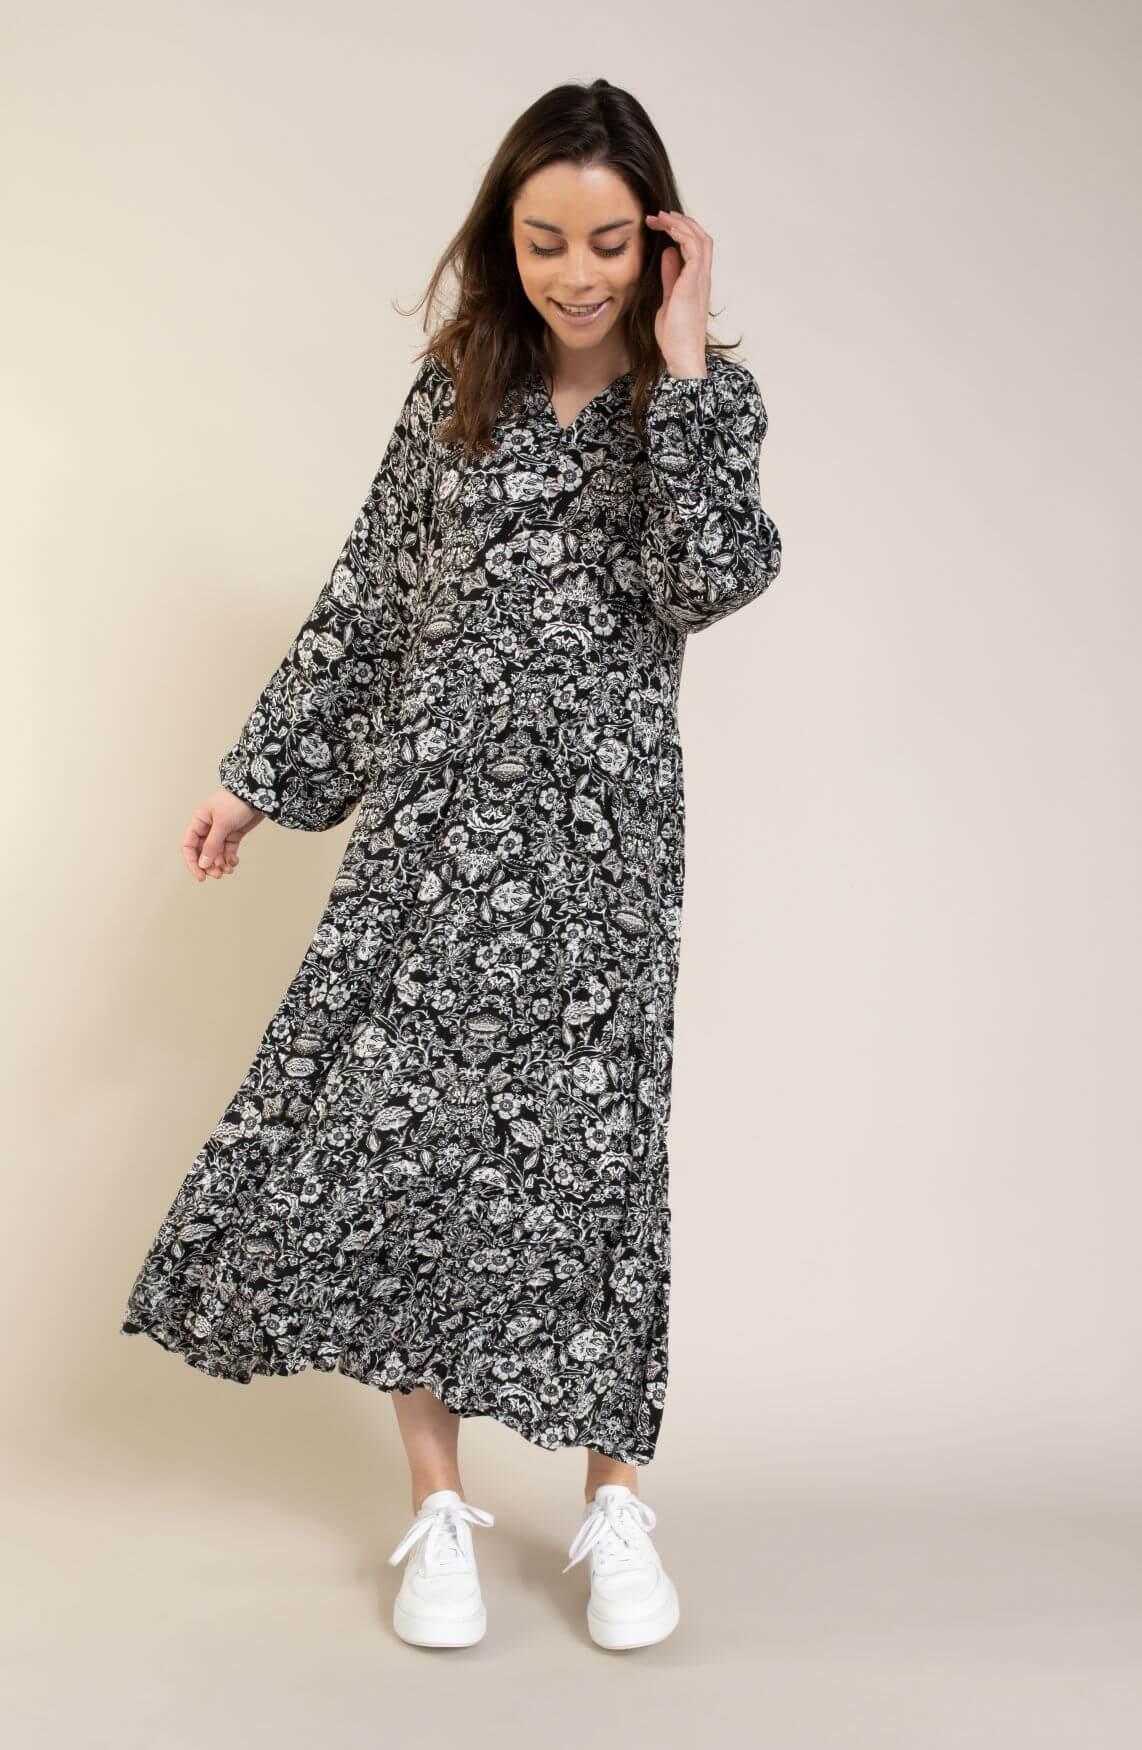 Alix The Label Dames Flower jurk Zwart